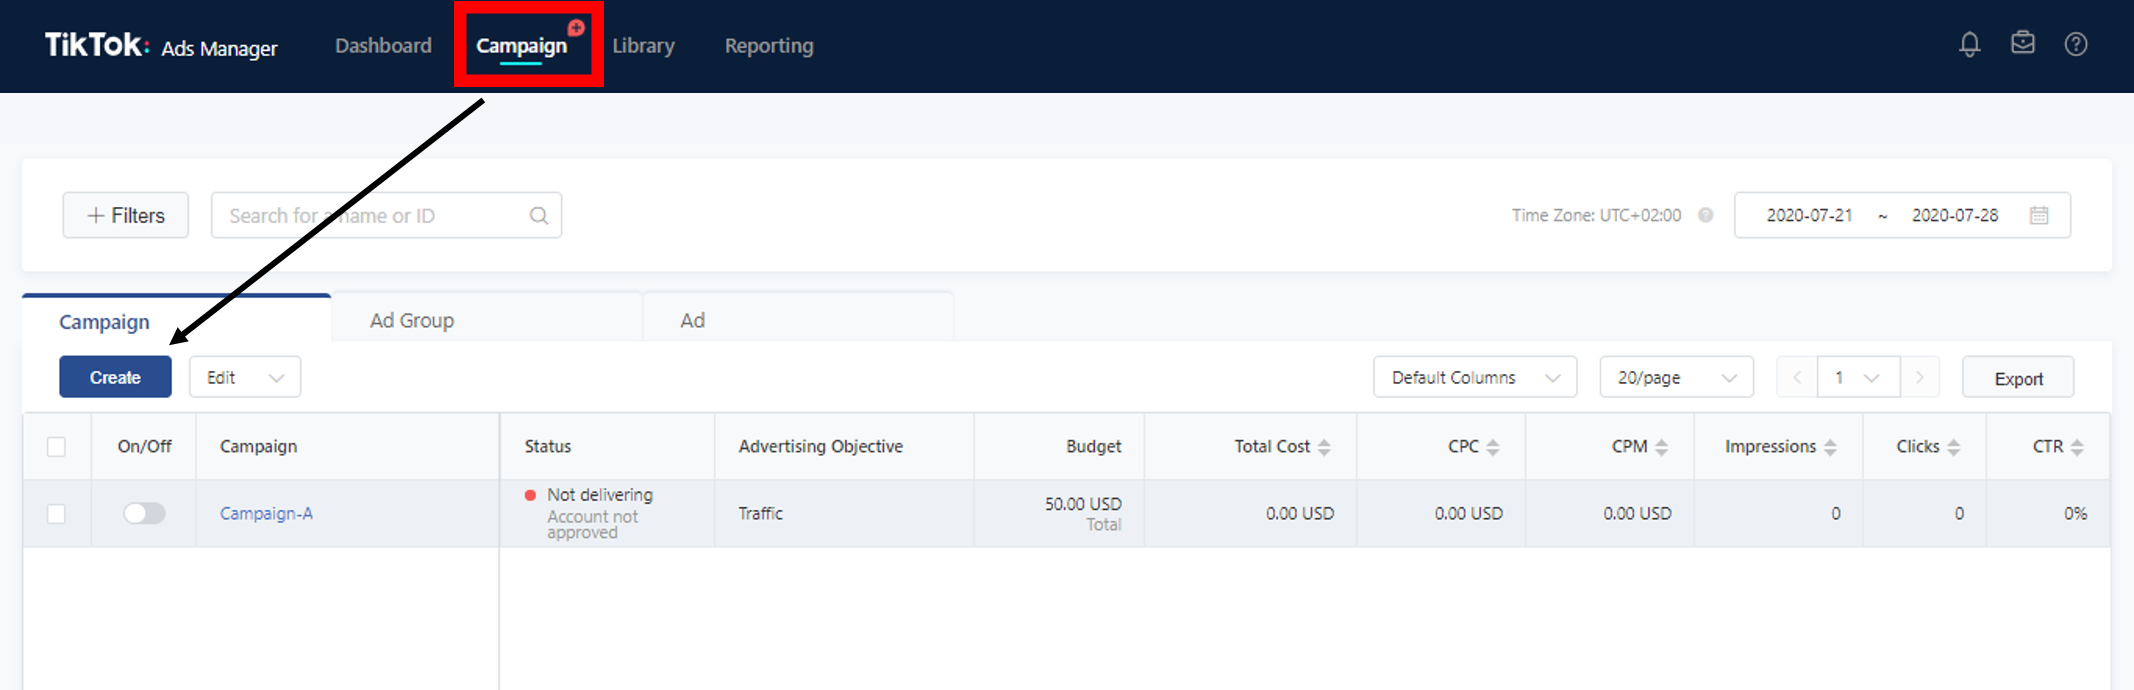 Create your TikTok Ads Campaign Using TikTok Marketing Basics - Affiliate Marketer's Guide